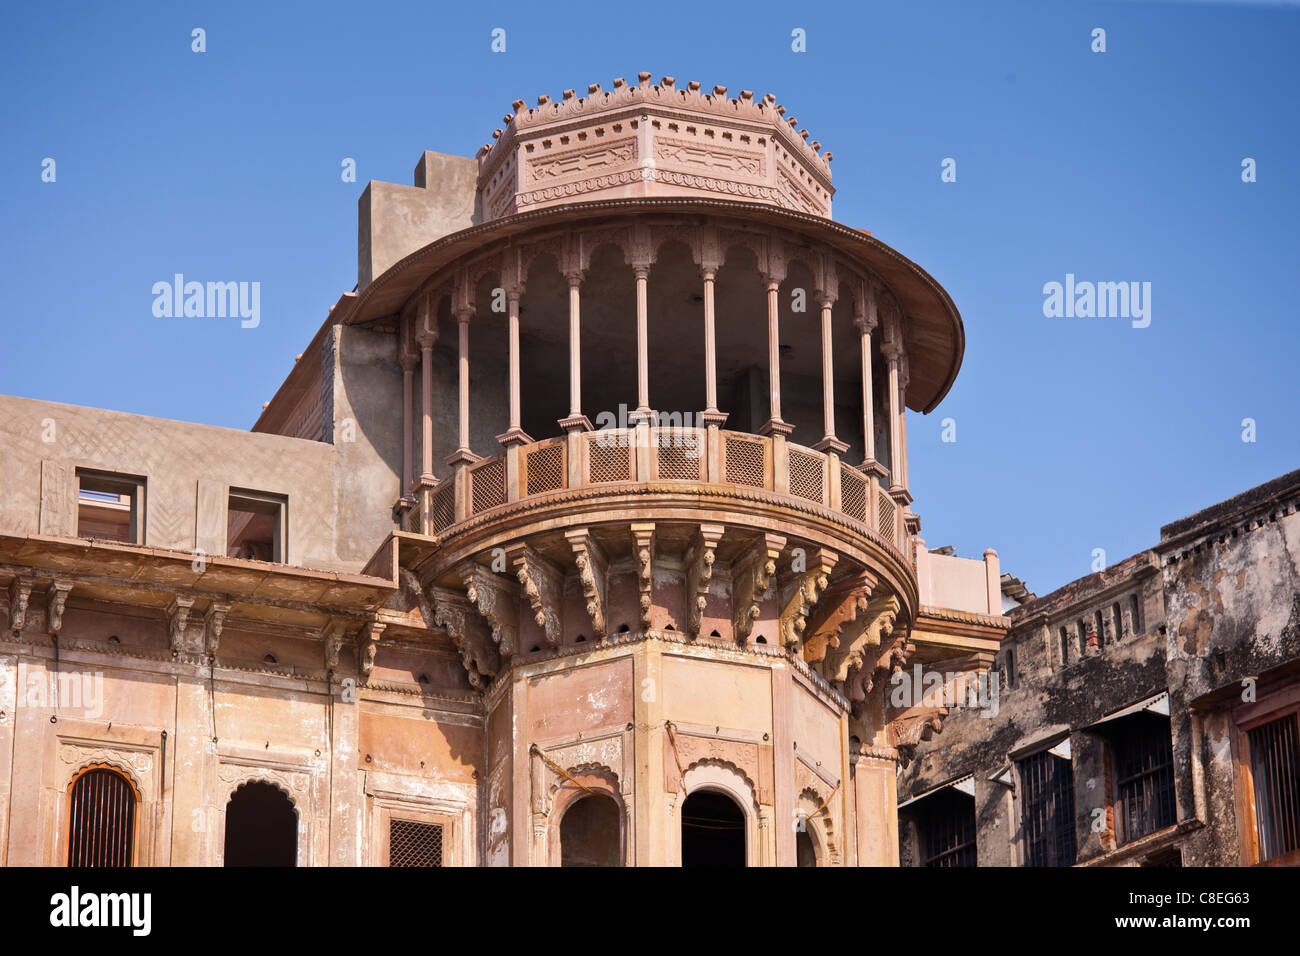 indian architecture of dharbanga ghat in varanasi new luxury clarks